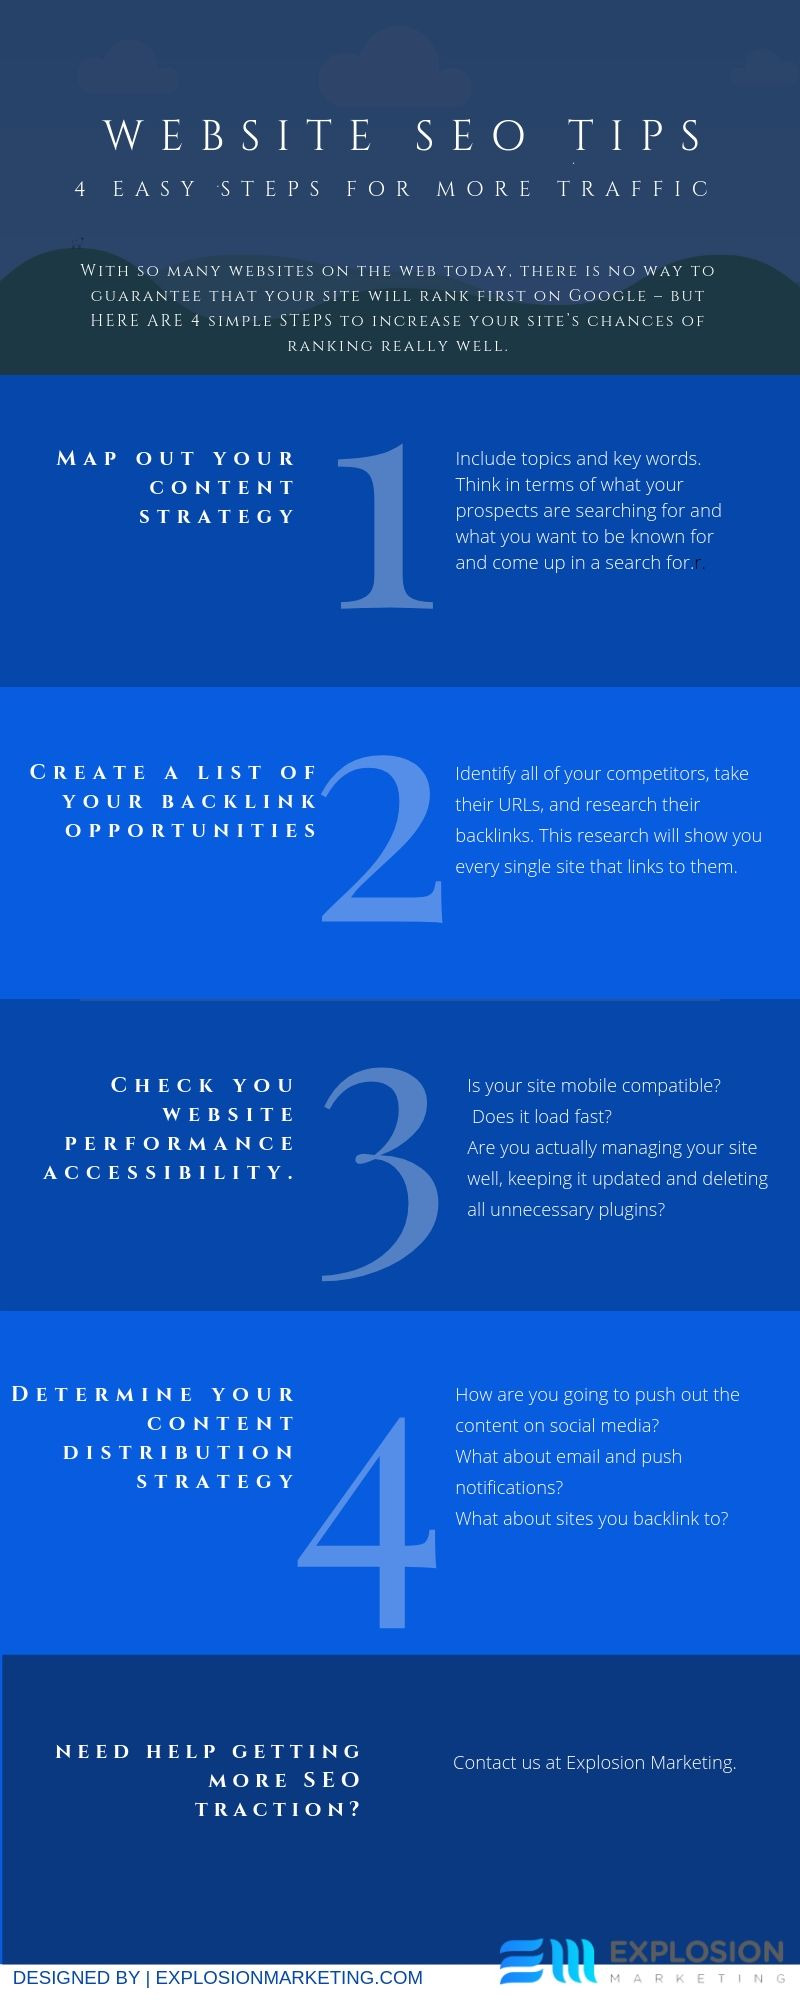 WEBSITE SEO TIPS Infographic